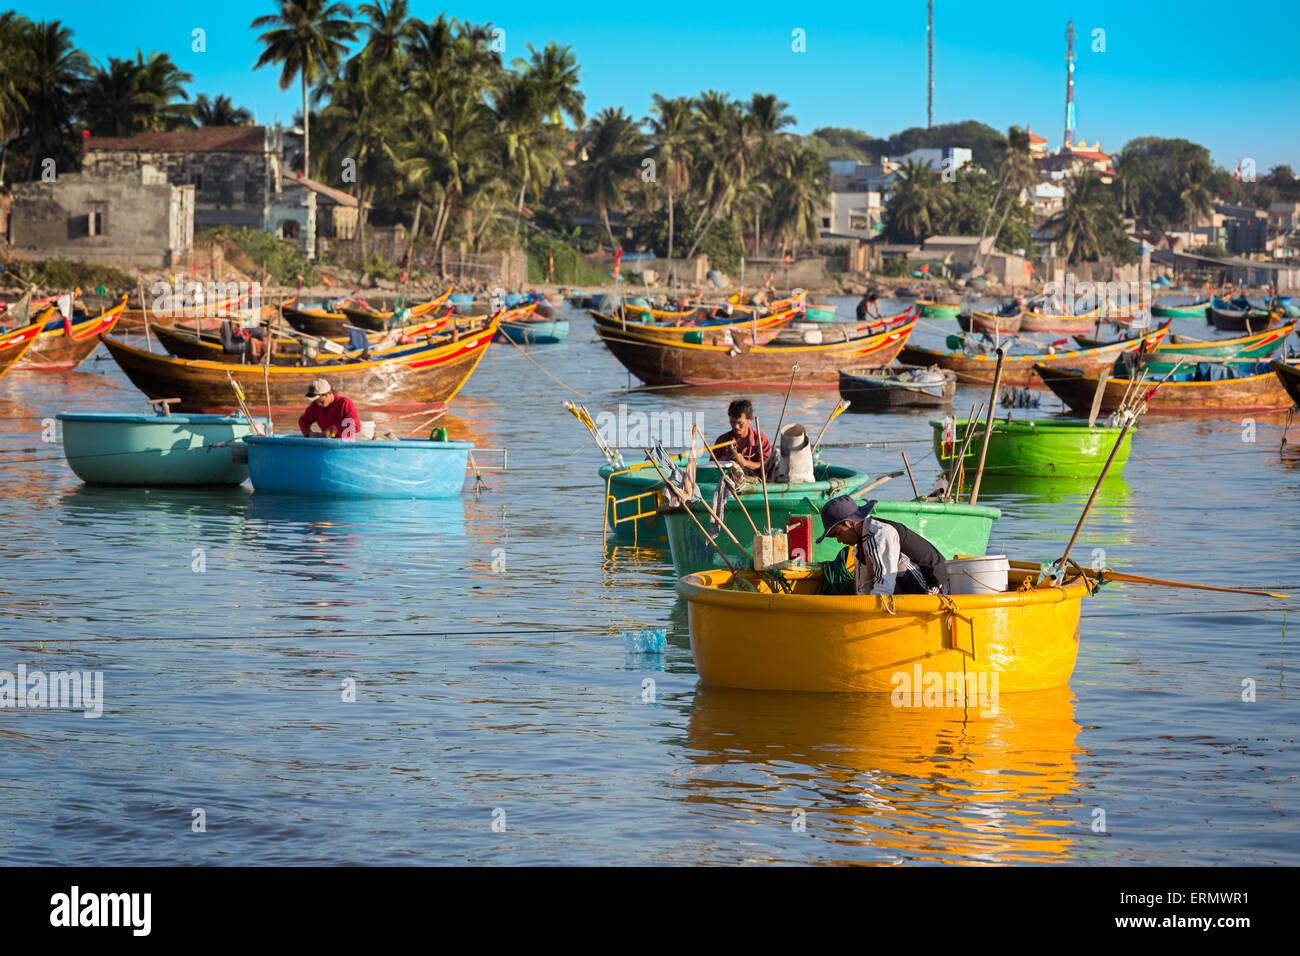 MUI NE, VIETNAM - FEBRUARY 08 - Fishermen in traditional small fishing boats - Stock Image